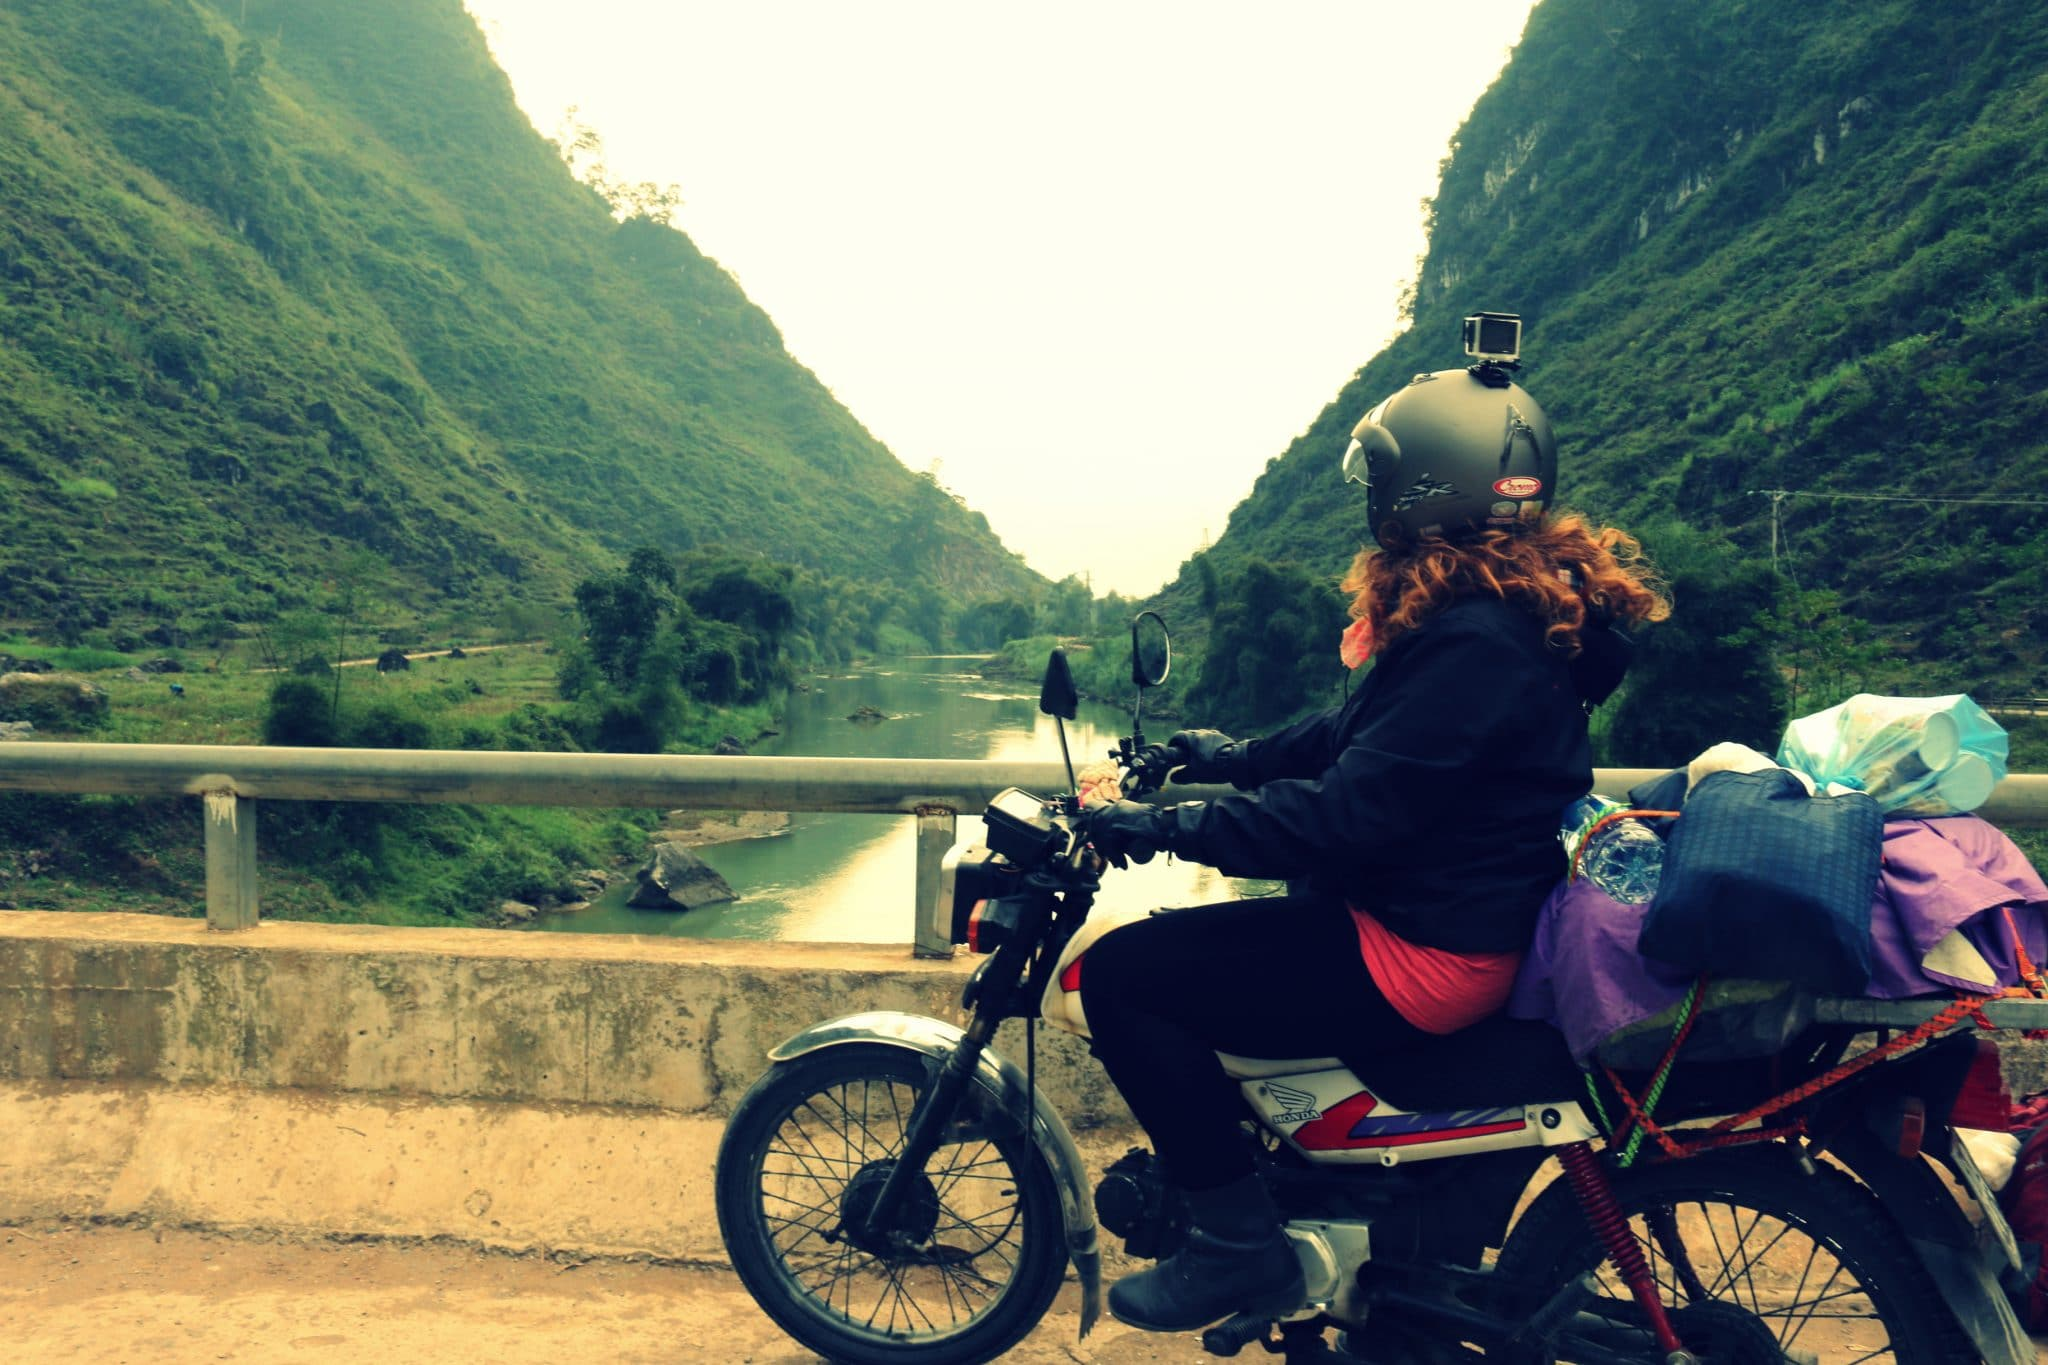 Cynthia Castelletti sur sa deuxième moto au Vietnam